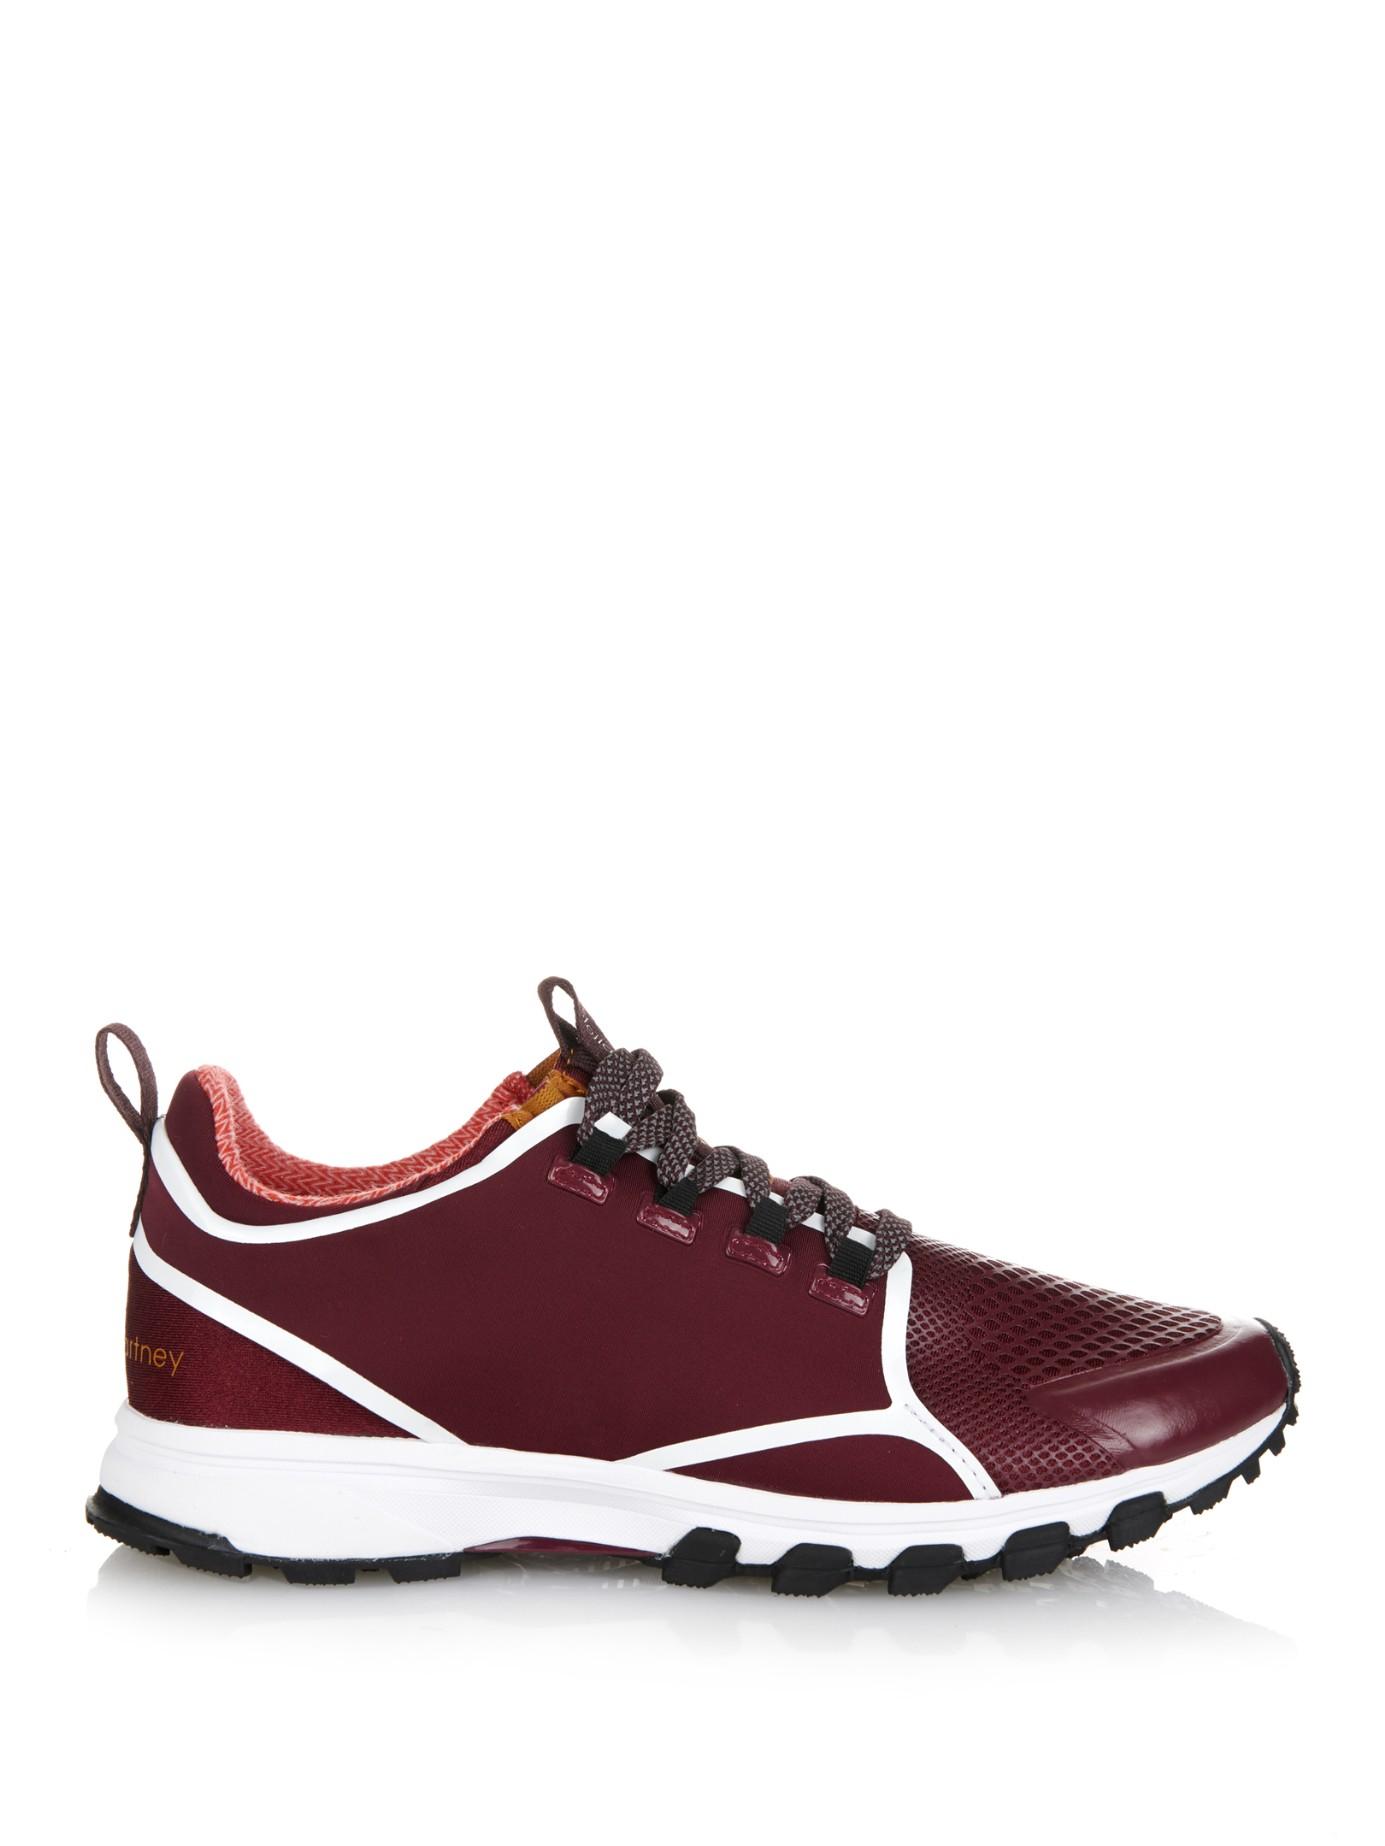 Top Low Adidas By Stella Mccartney Adizero Synthetic Xt lFKJ1c